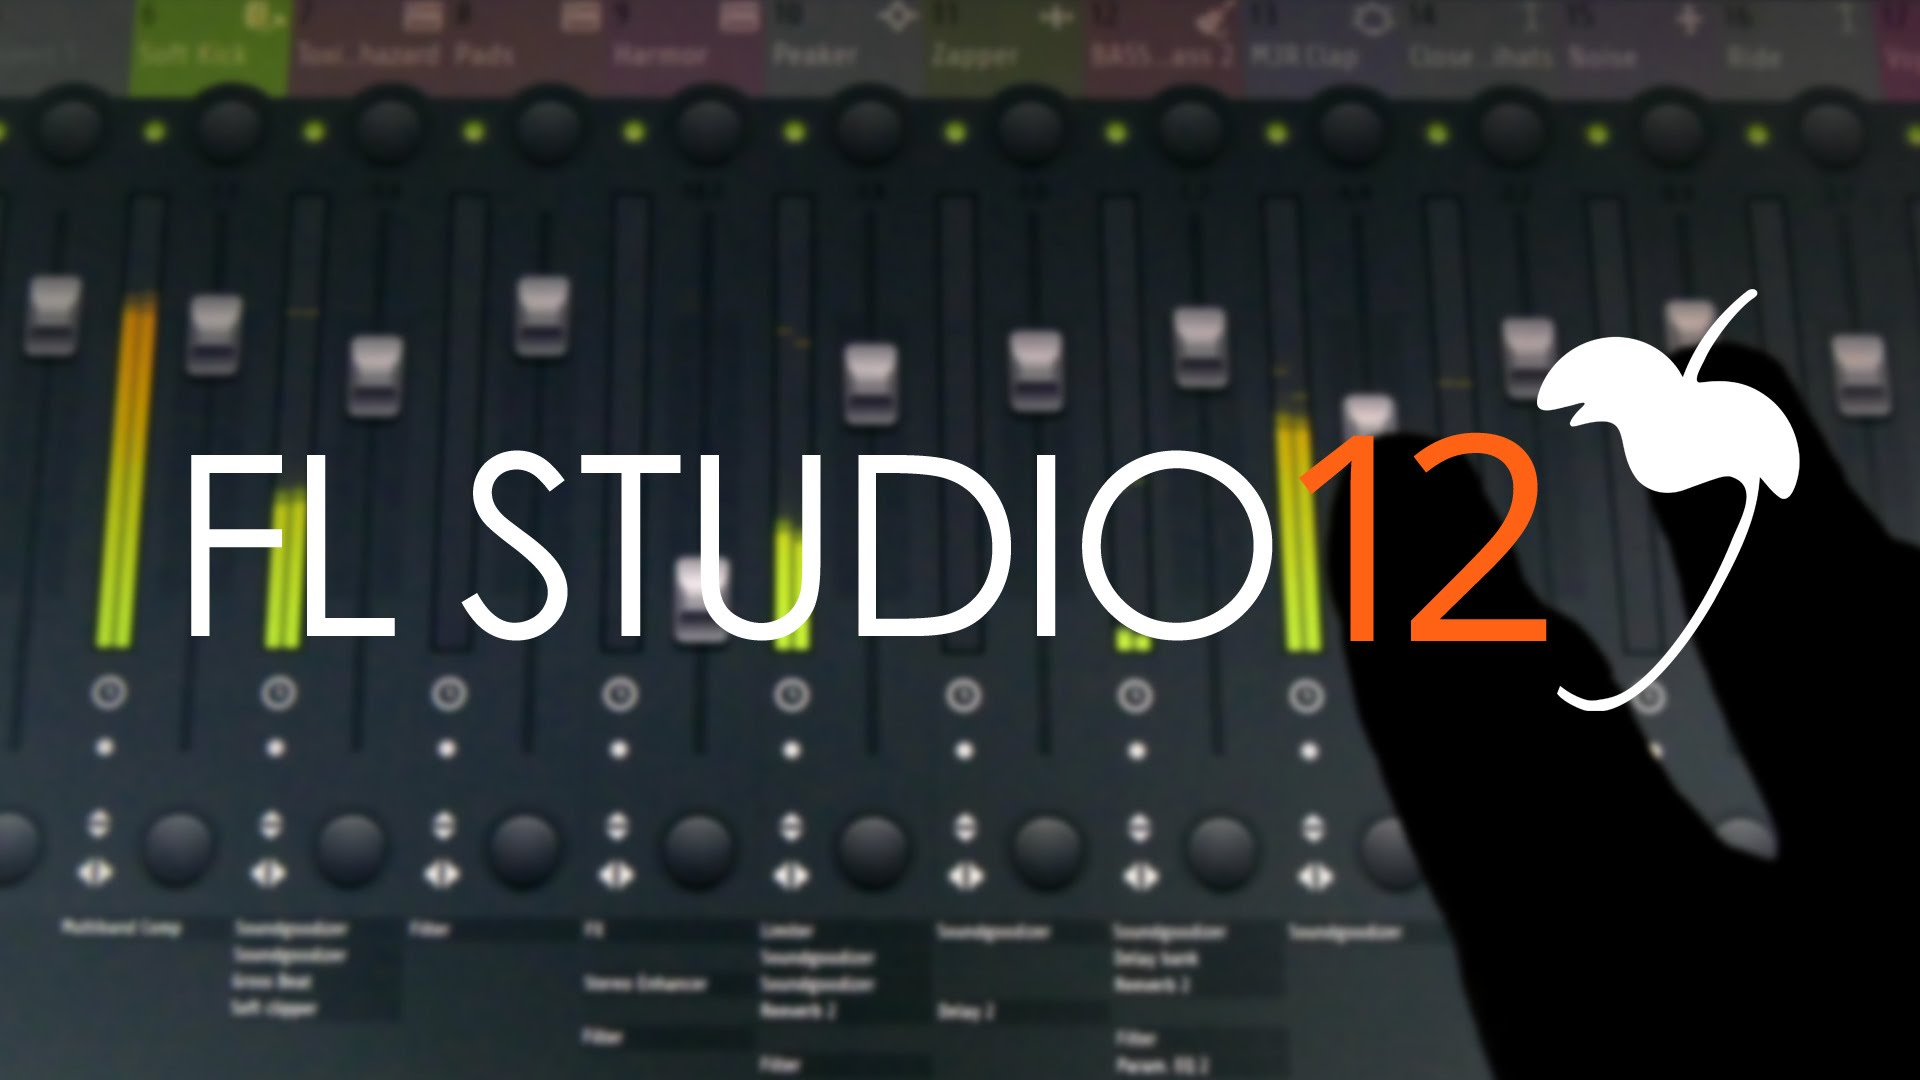 fl studio 12 free download utorrent